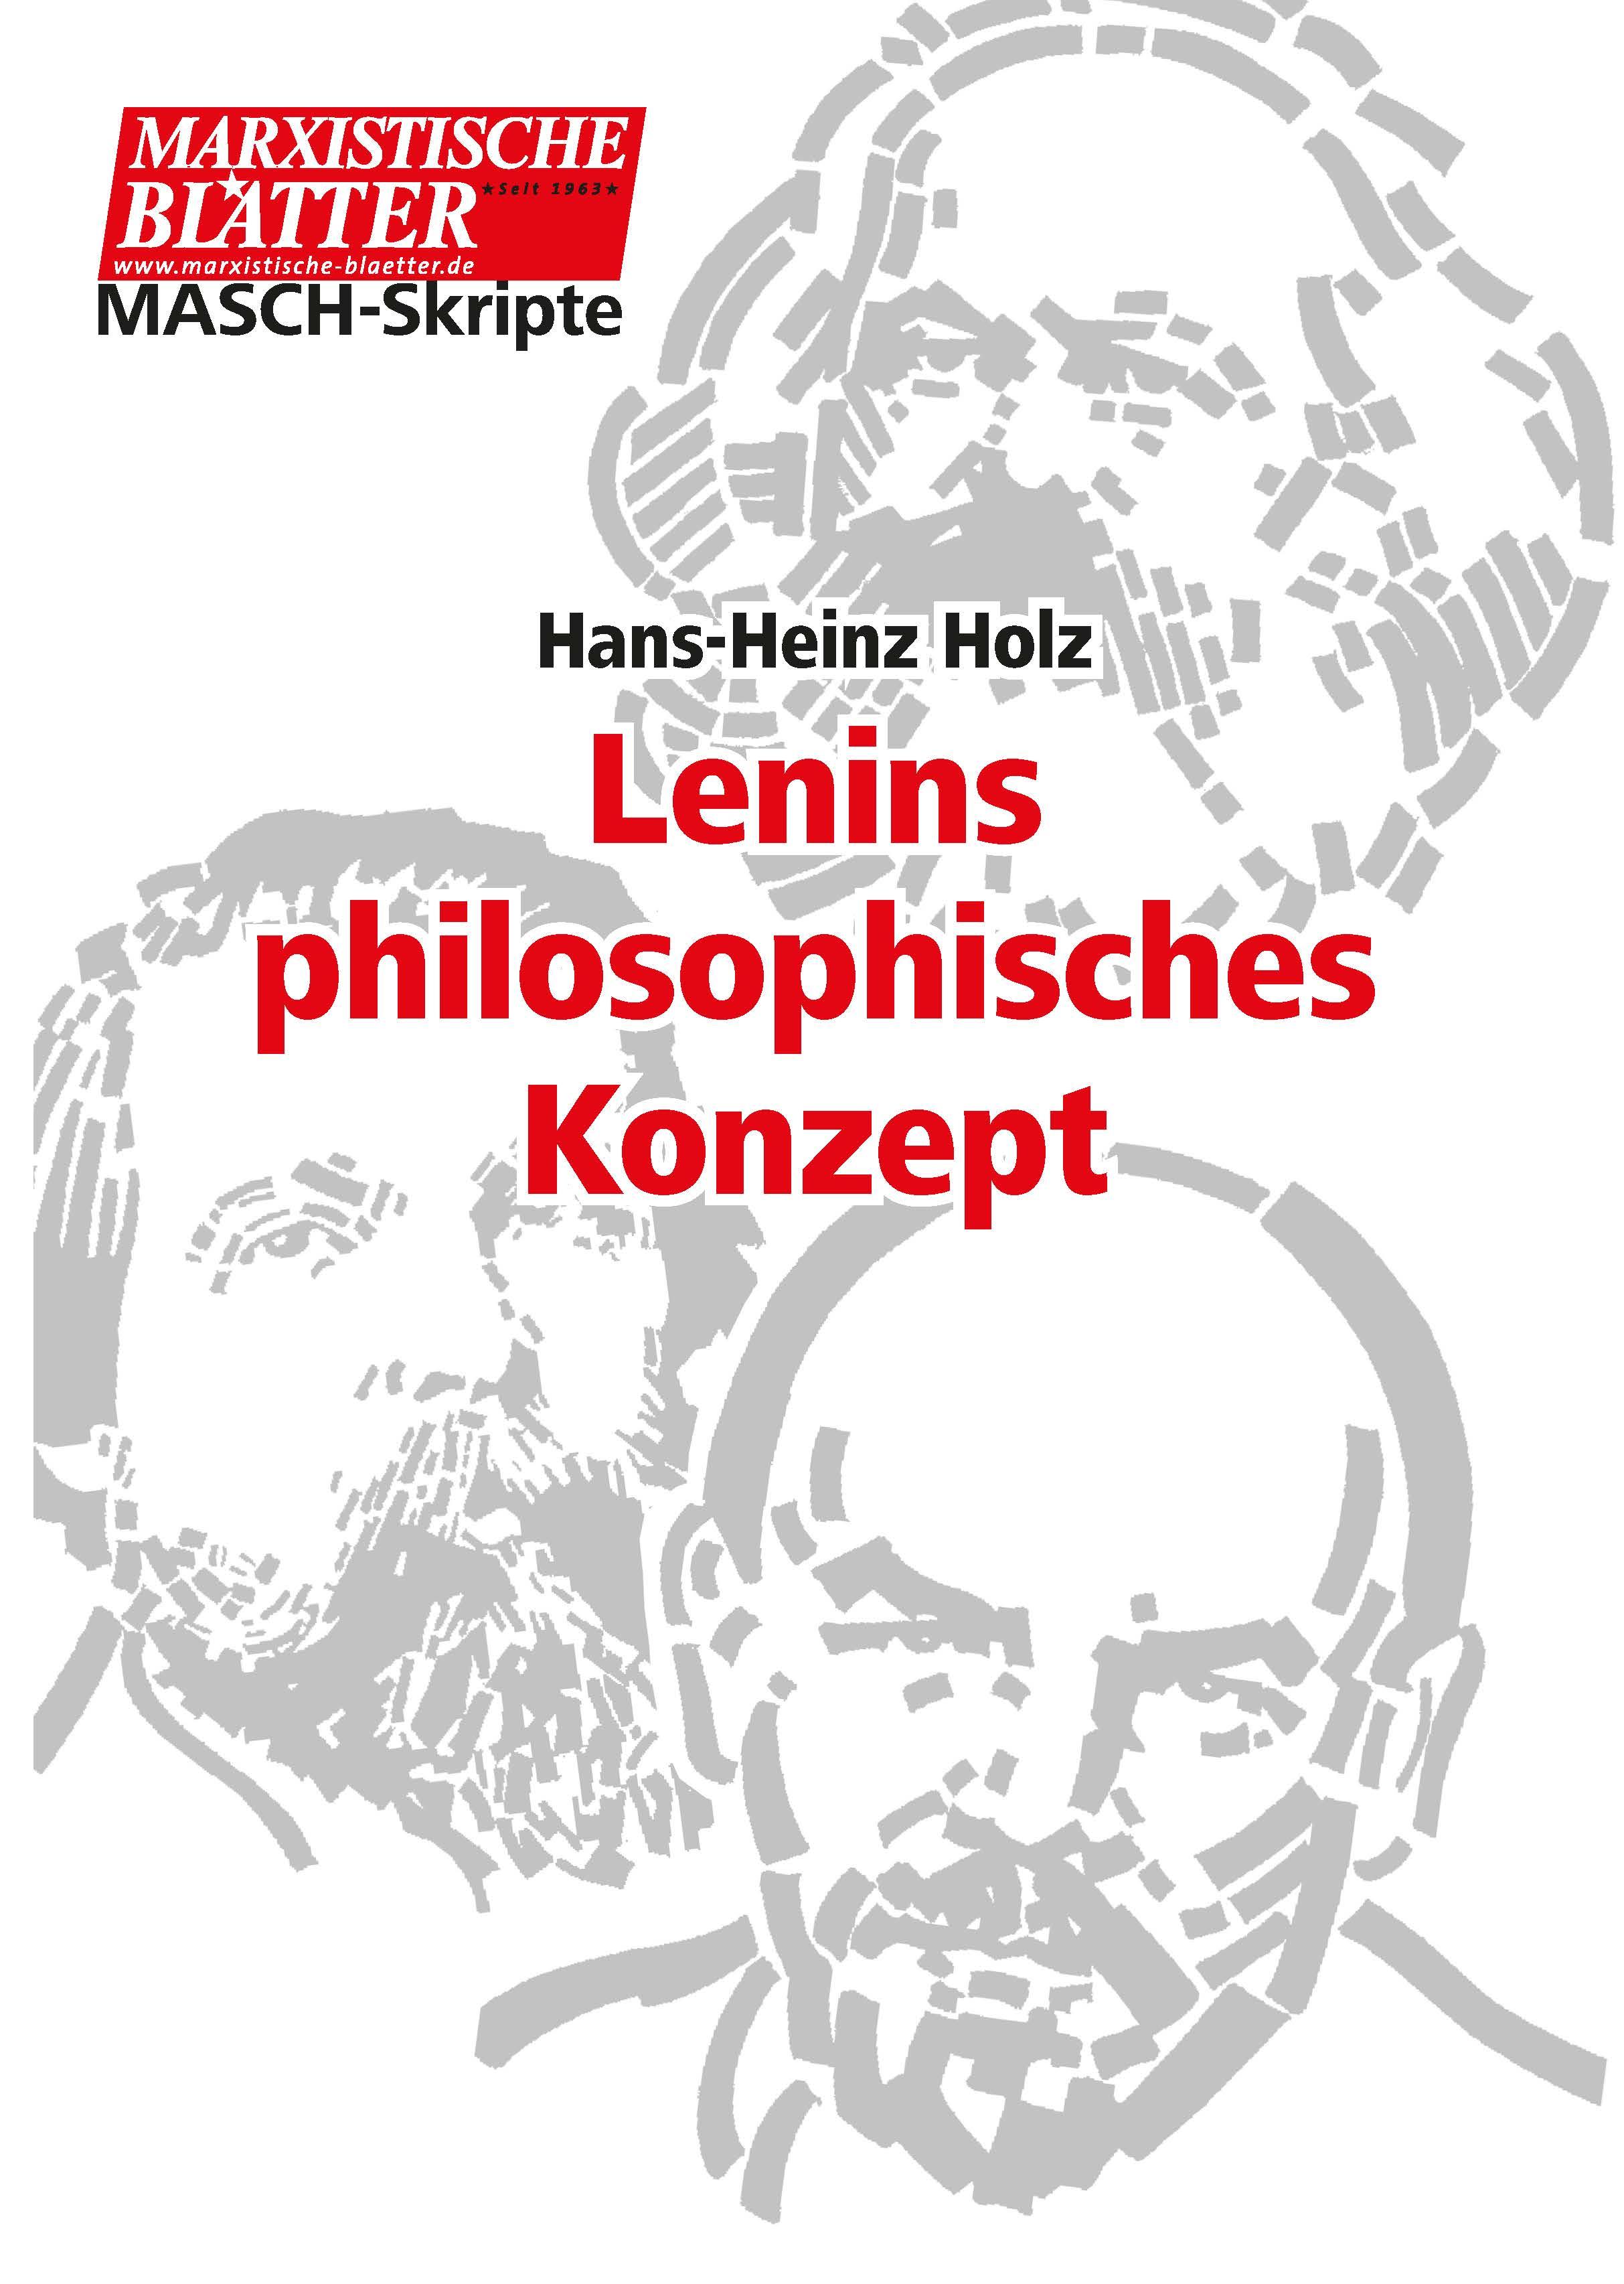 Lenins philosophisches Konzept